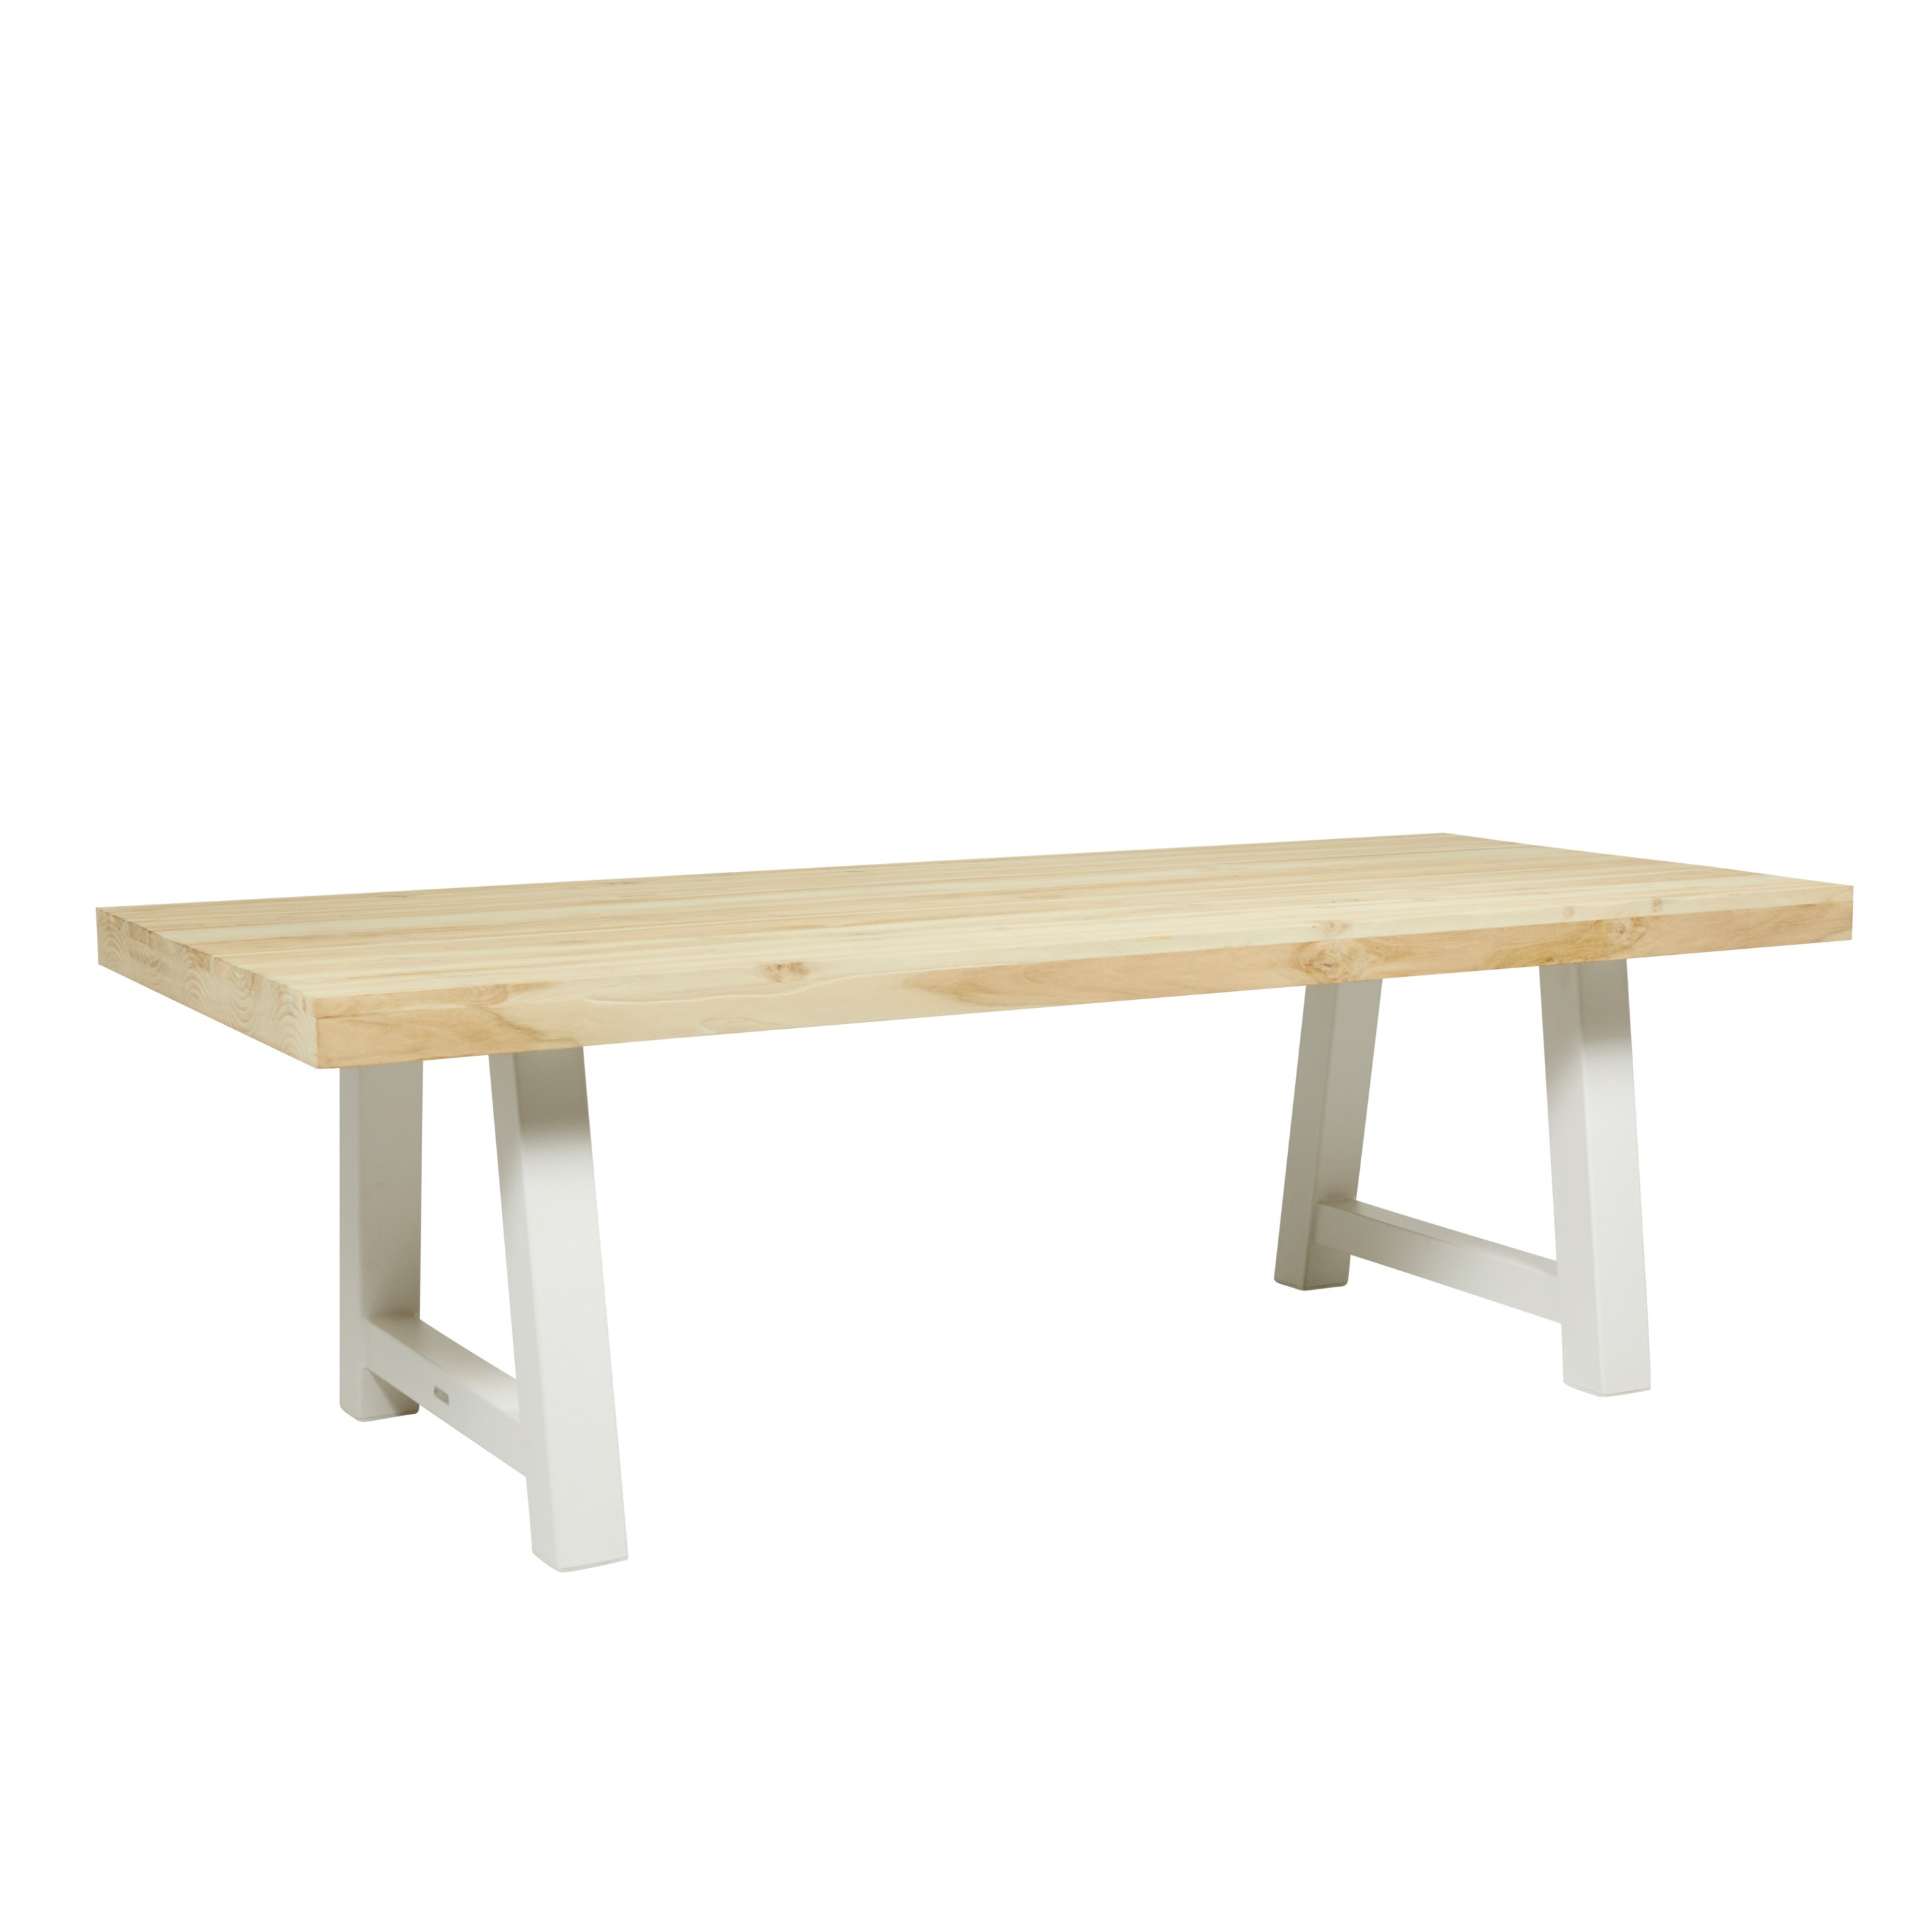 Furniture Hero-Images Dining-Tables granada-beach-ten-seater-01